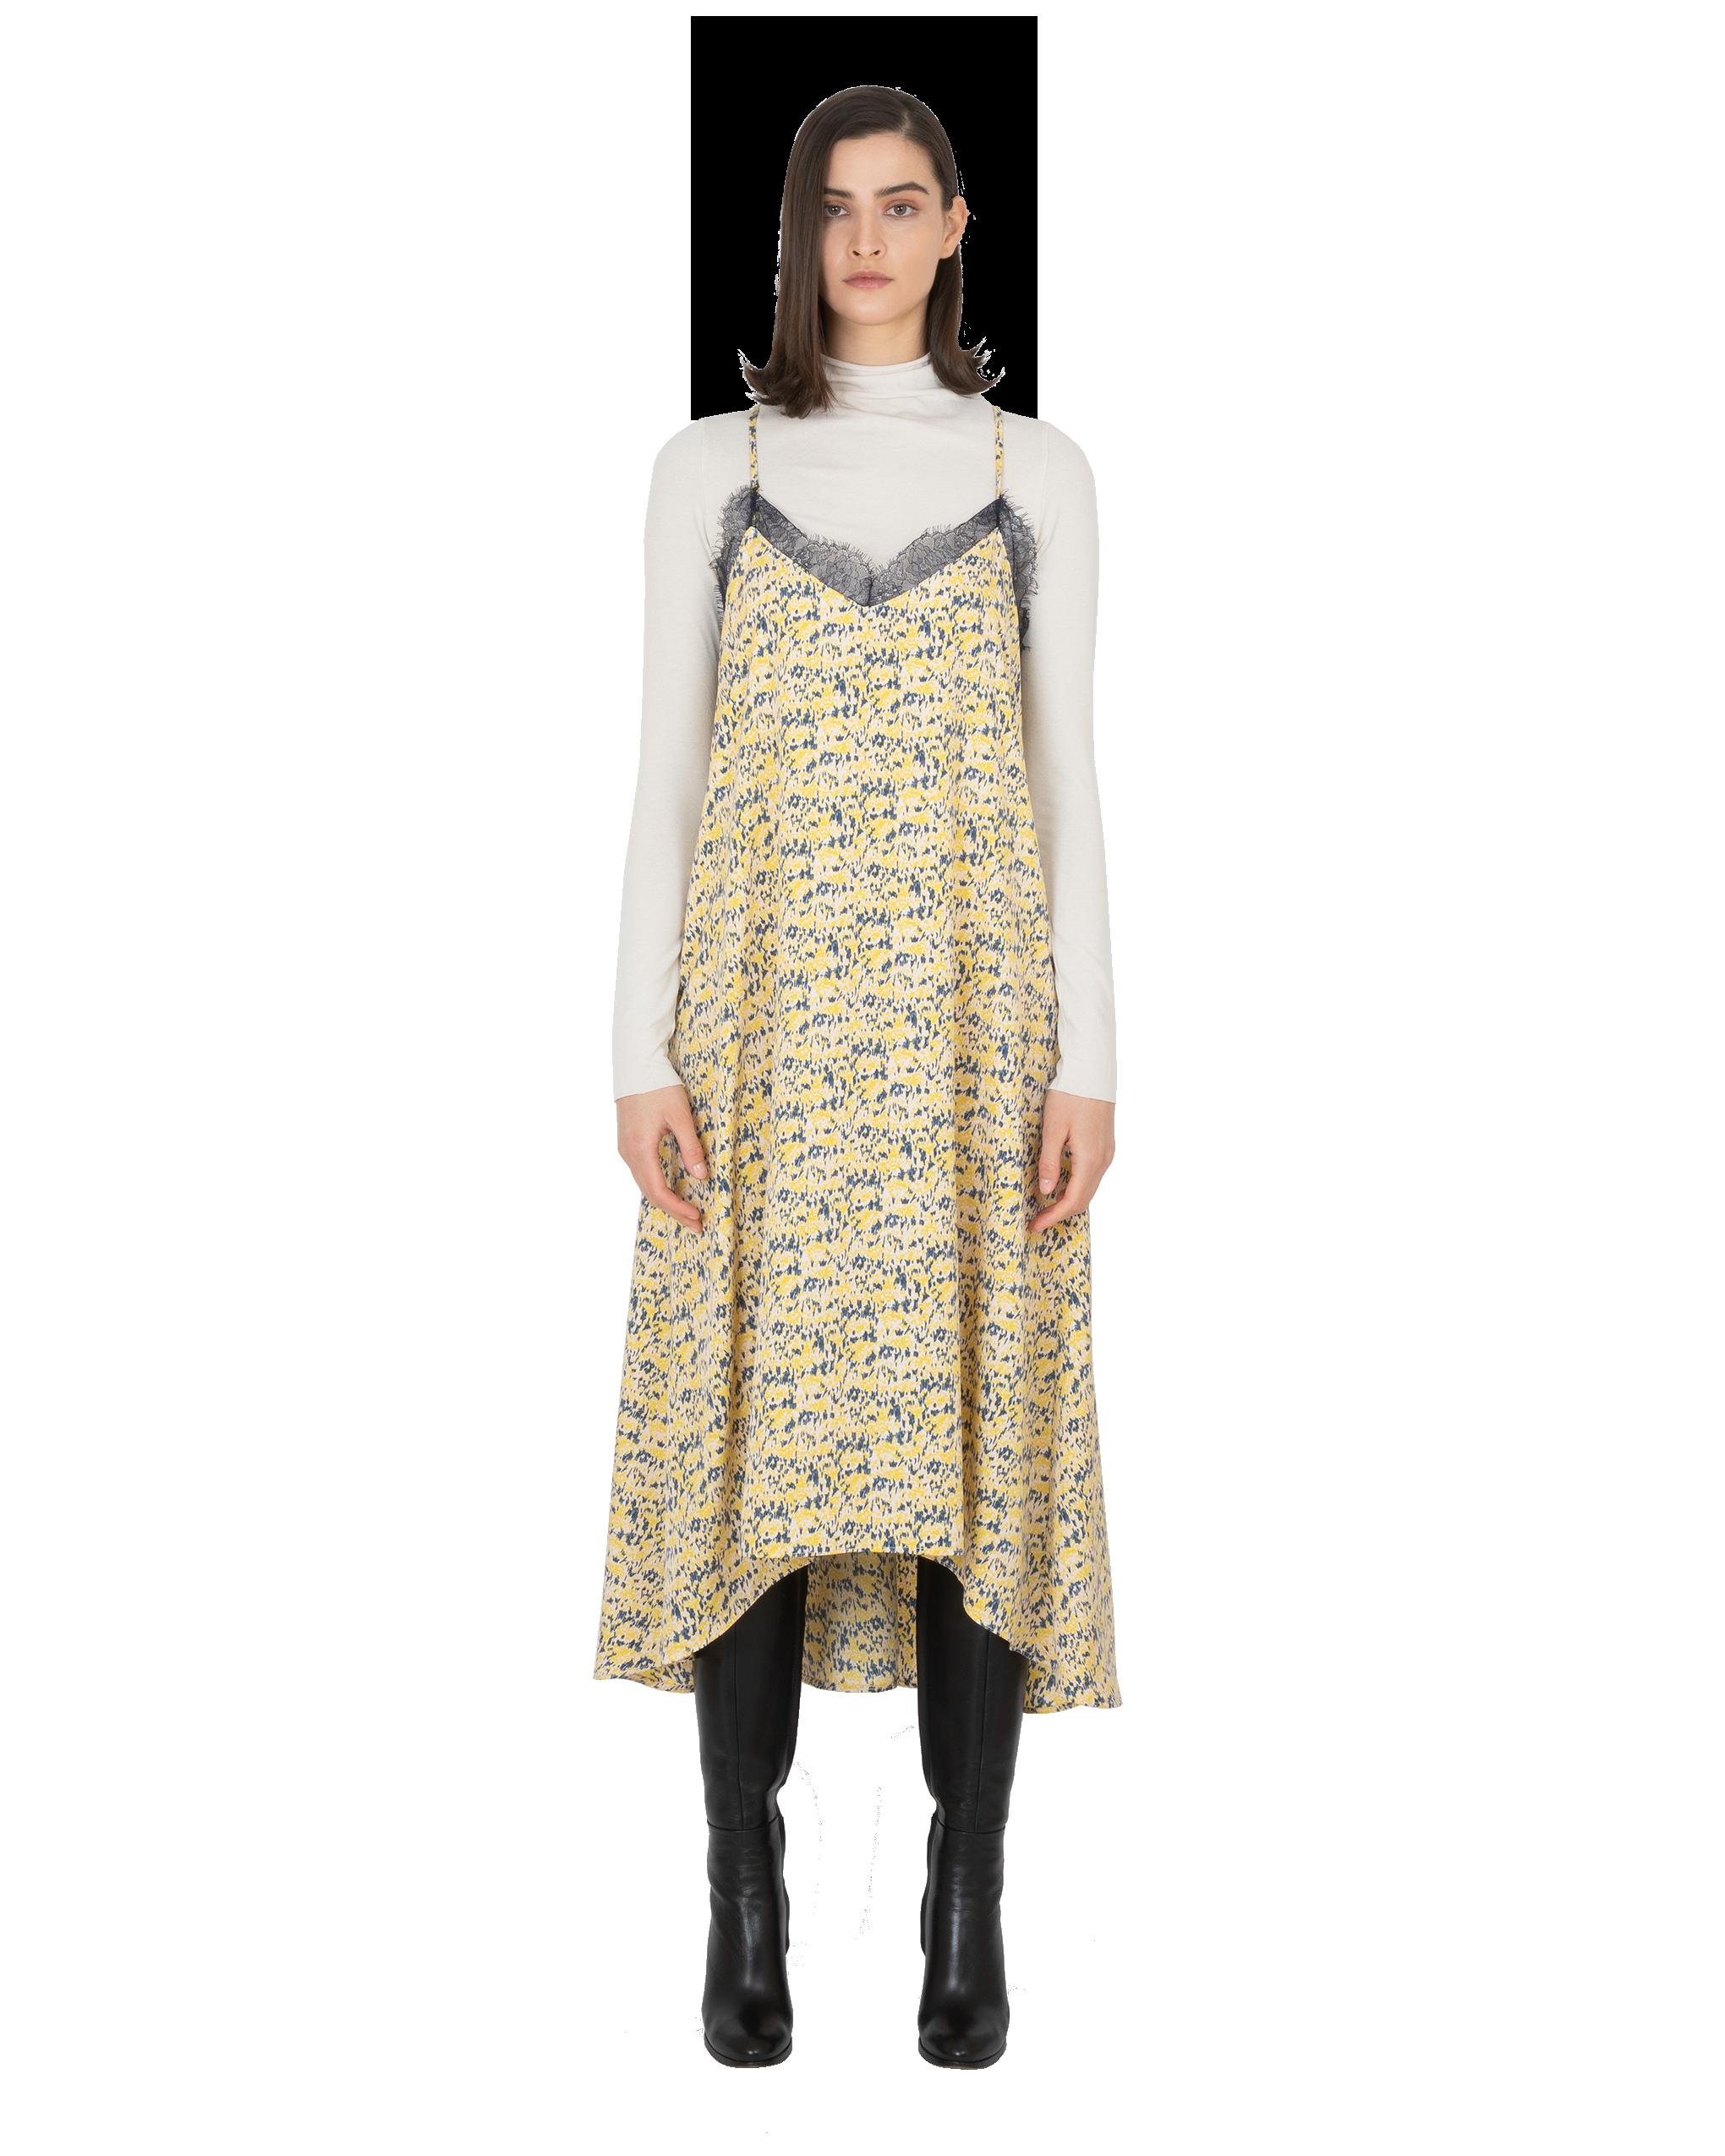 Model wearing EMIN + PAUL yellow print strappy dress.